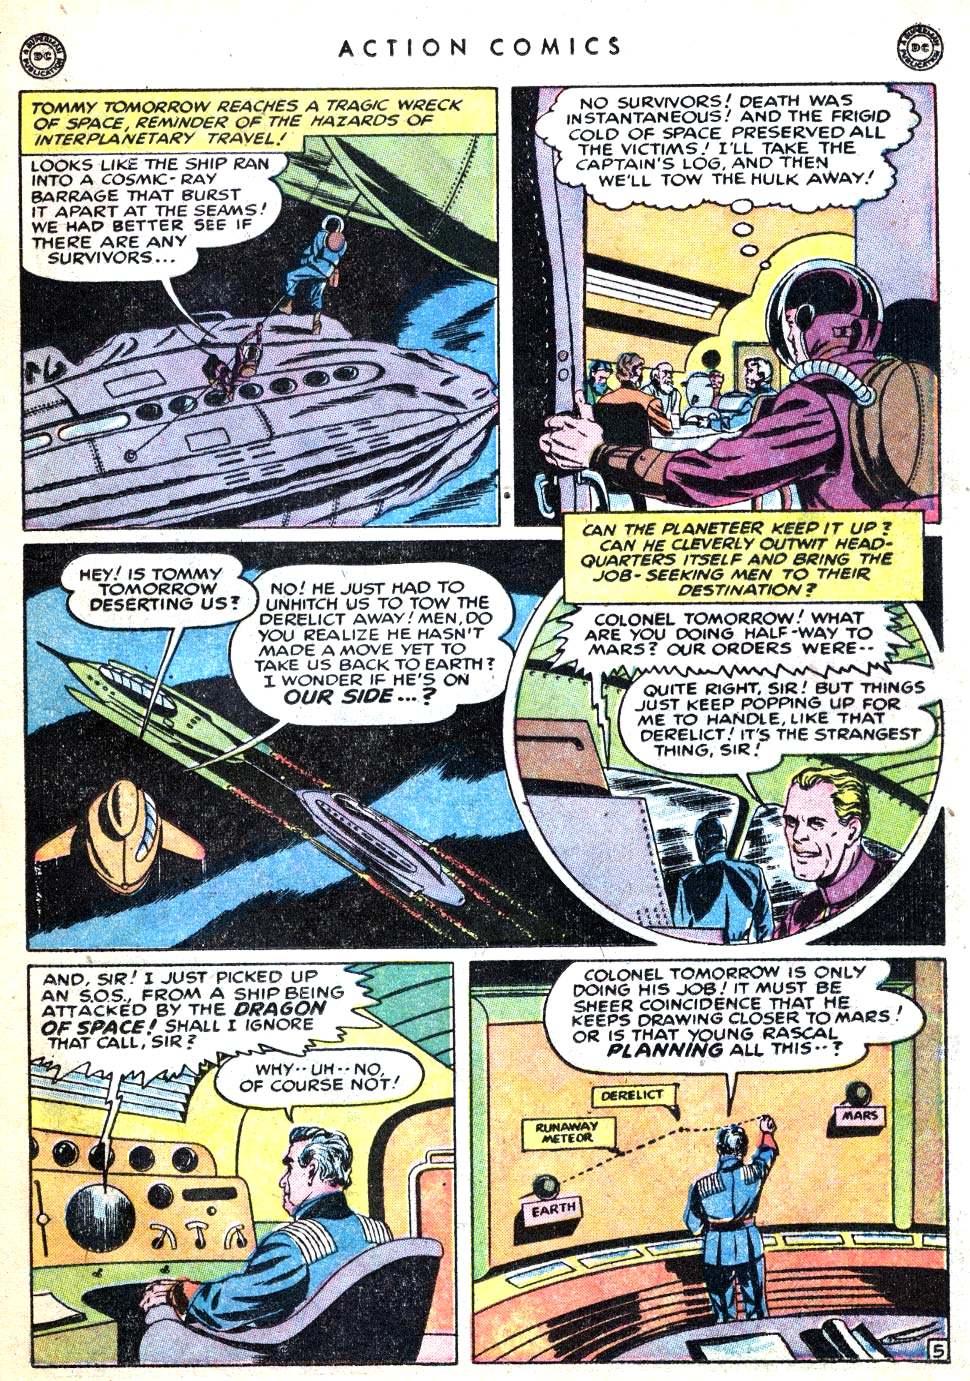 Action Comics (1938) 134 Page 20